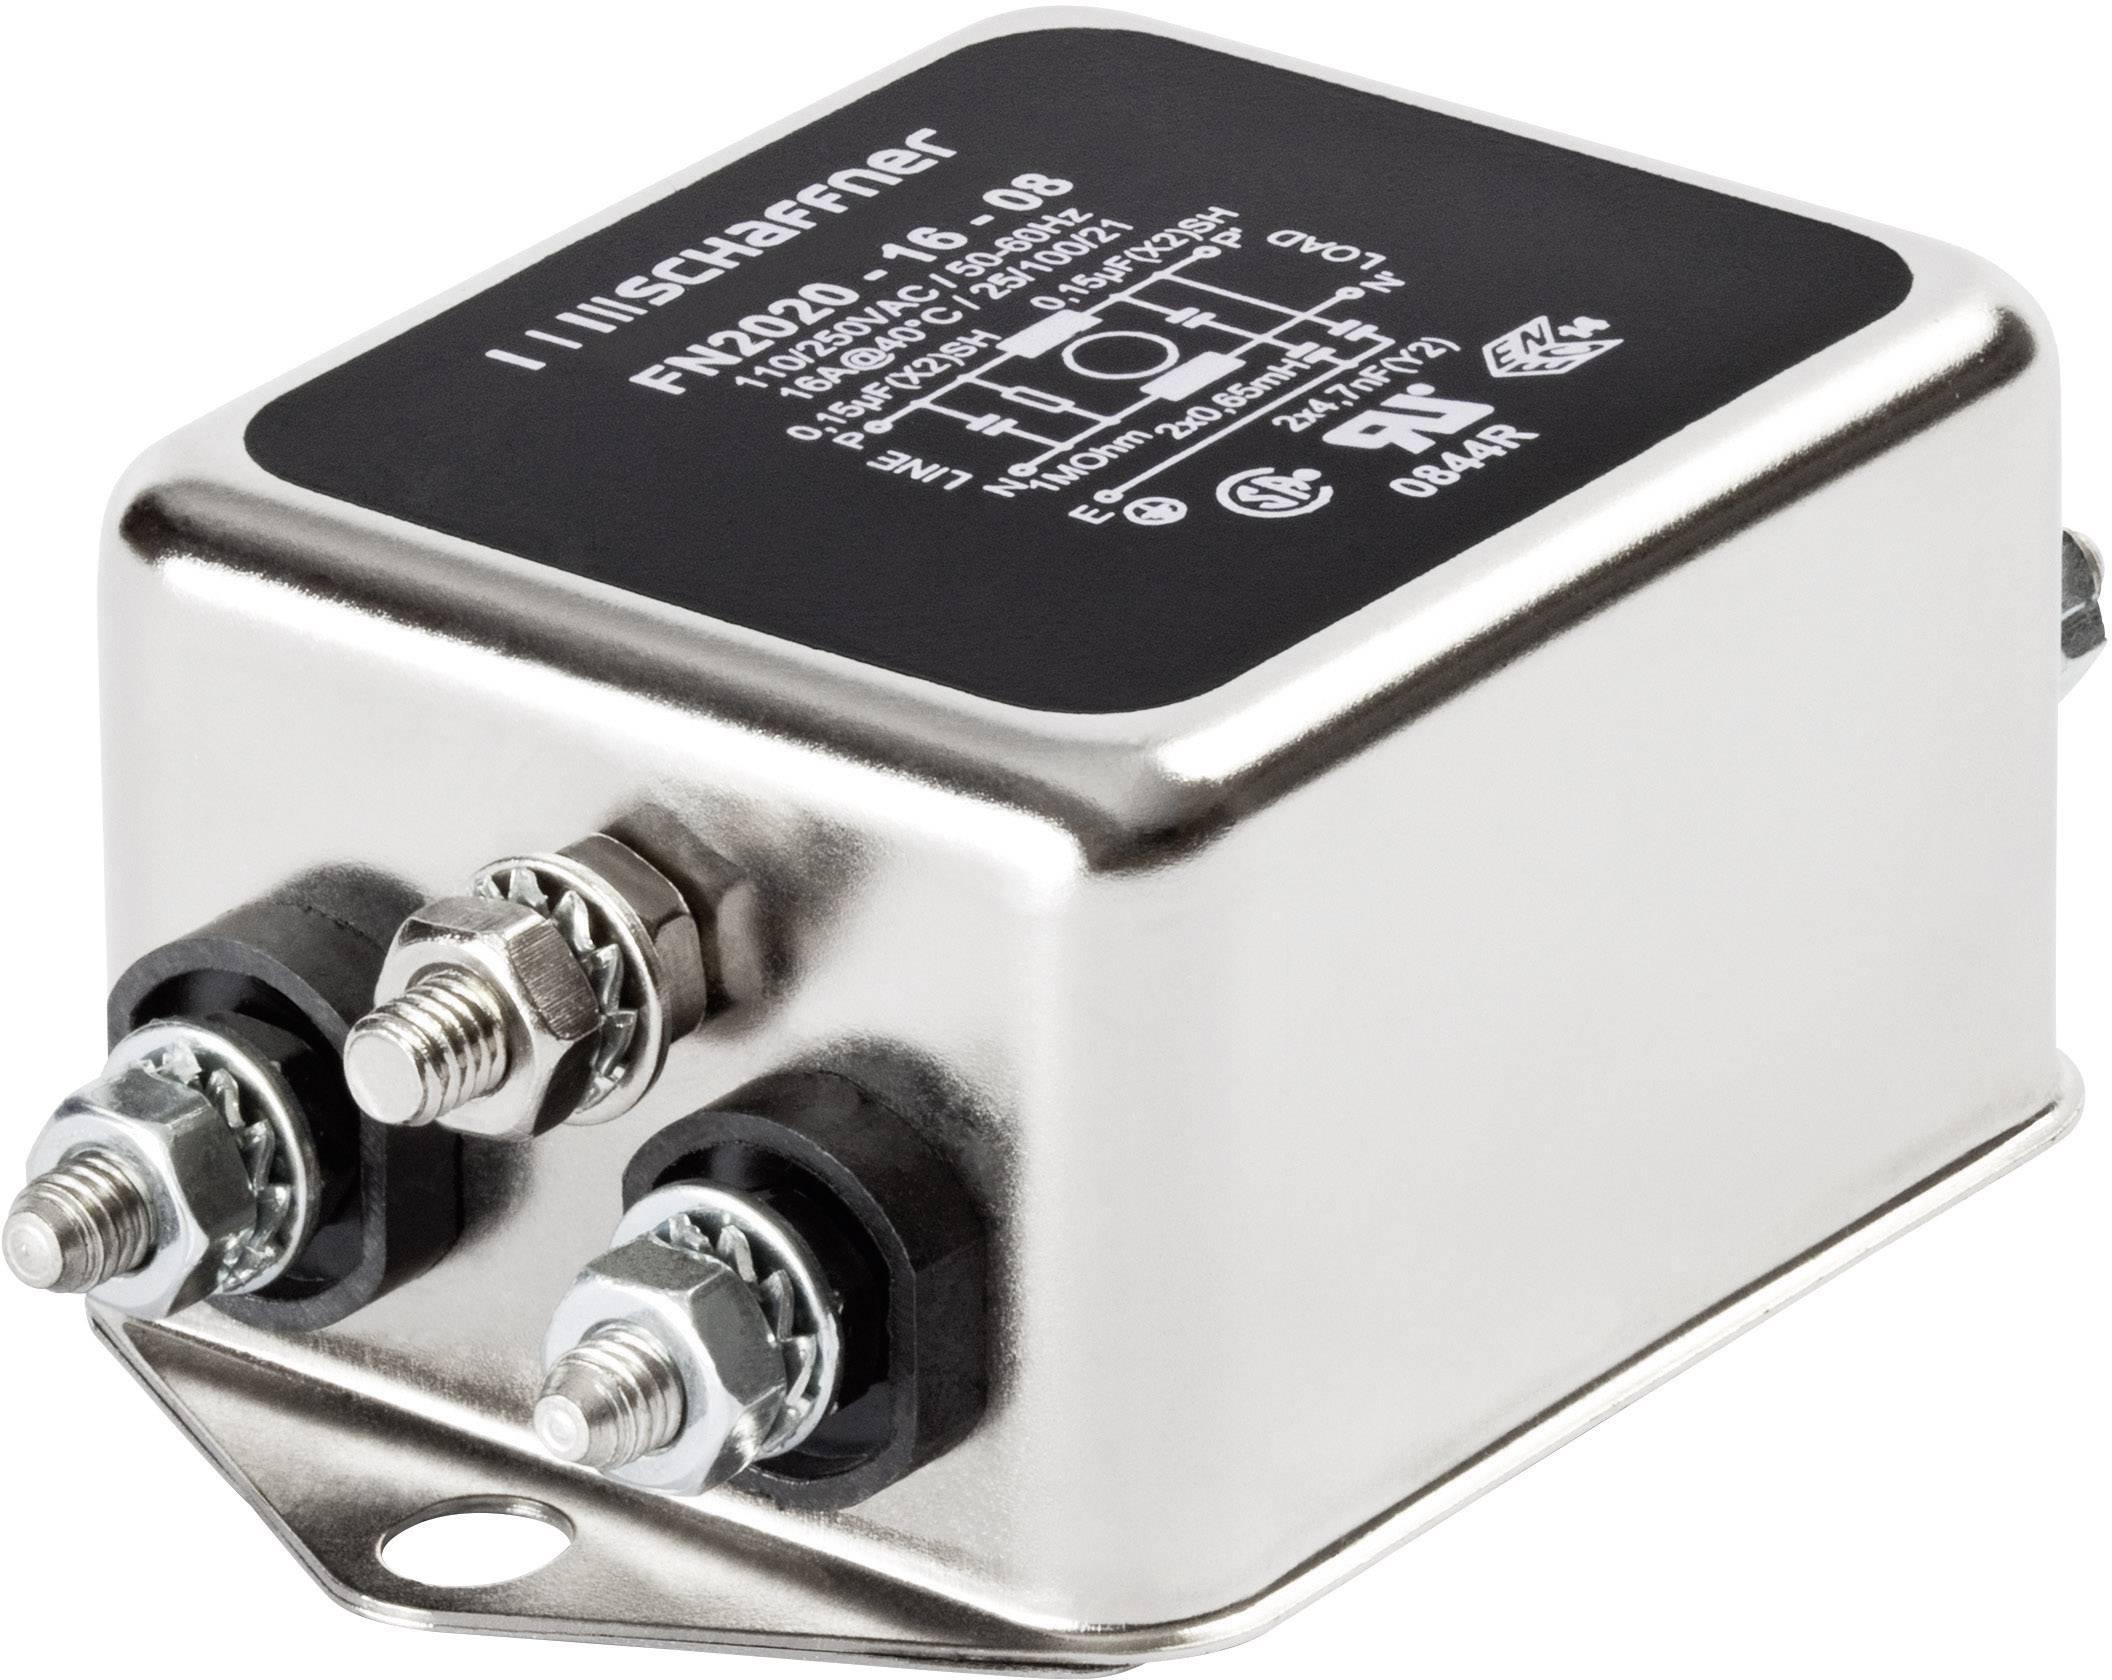 Síťový filtr Schaffner, FN 2020-20-06, 0,6 mH, 250 V/AC, 20 A